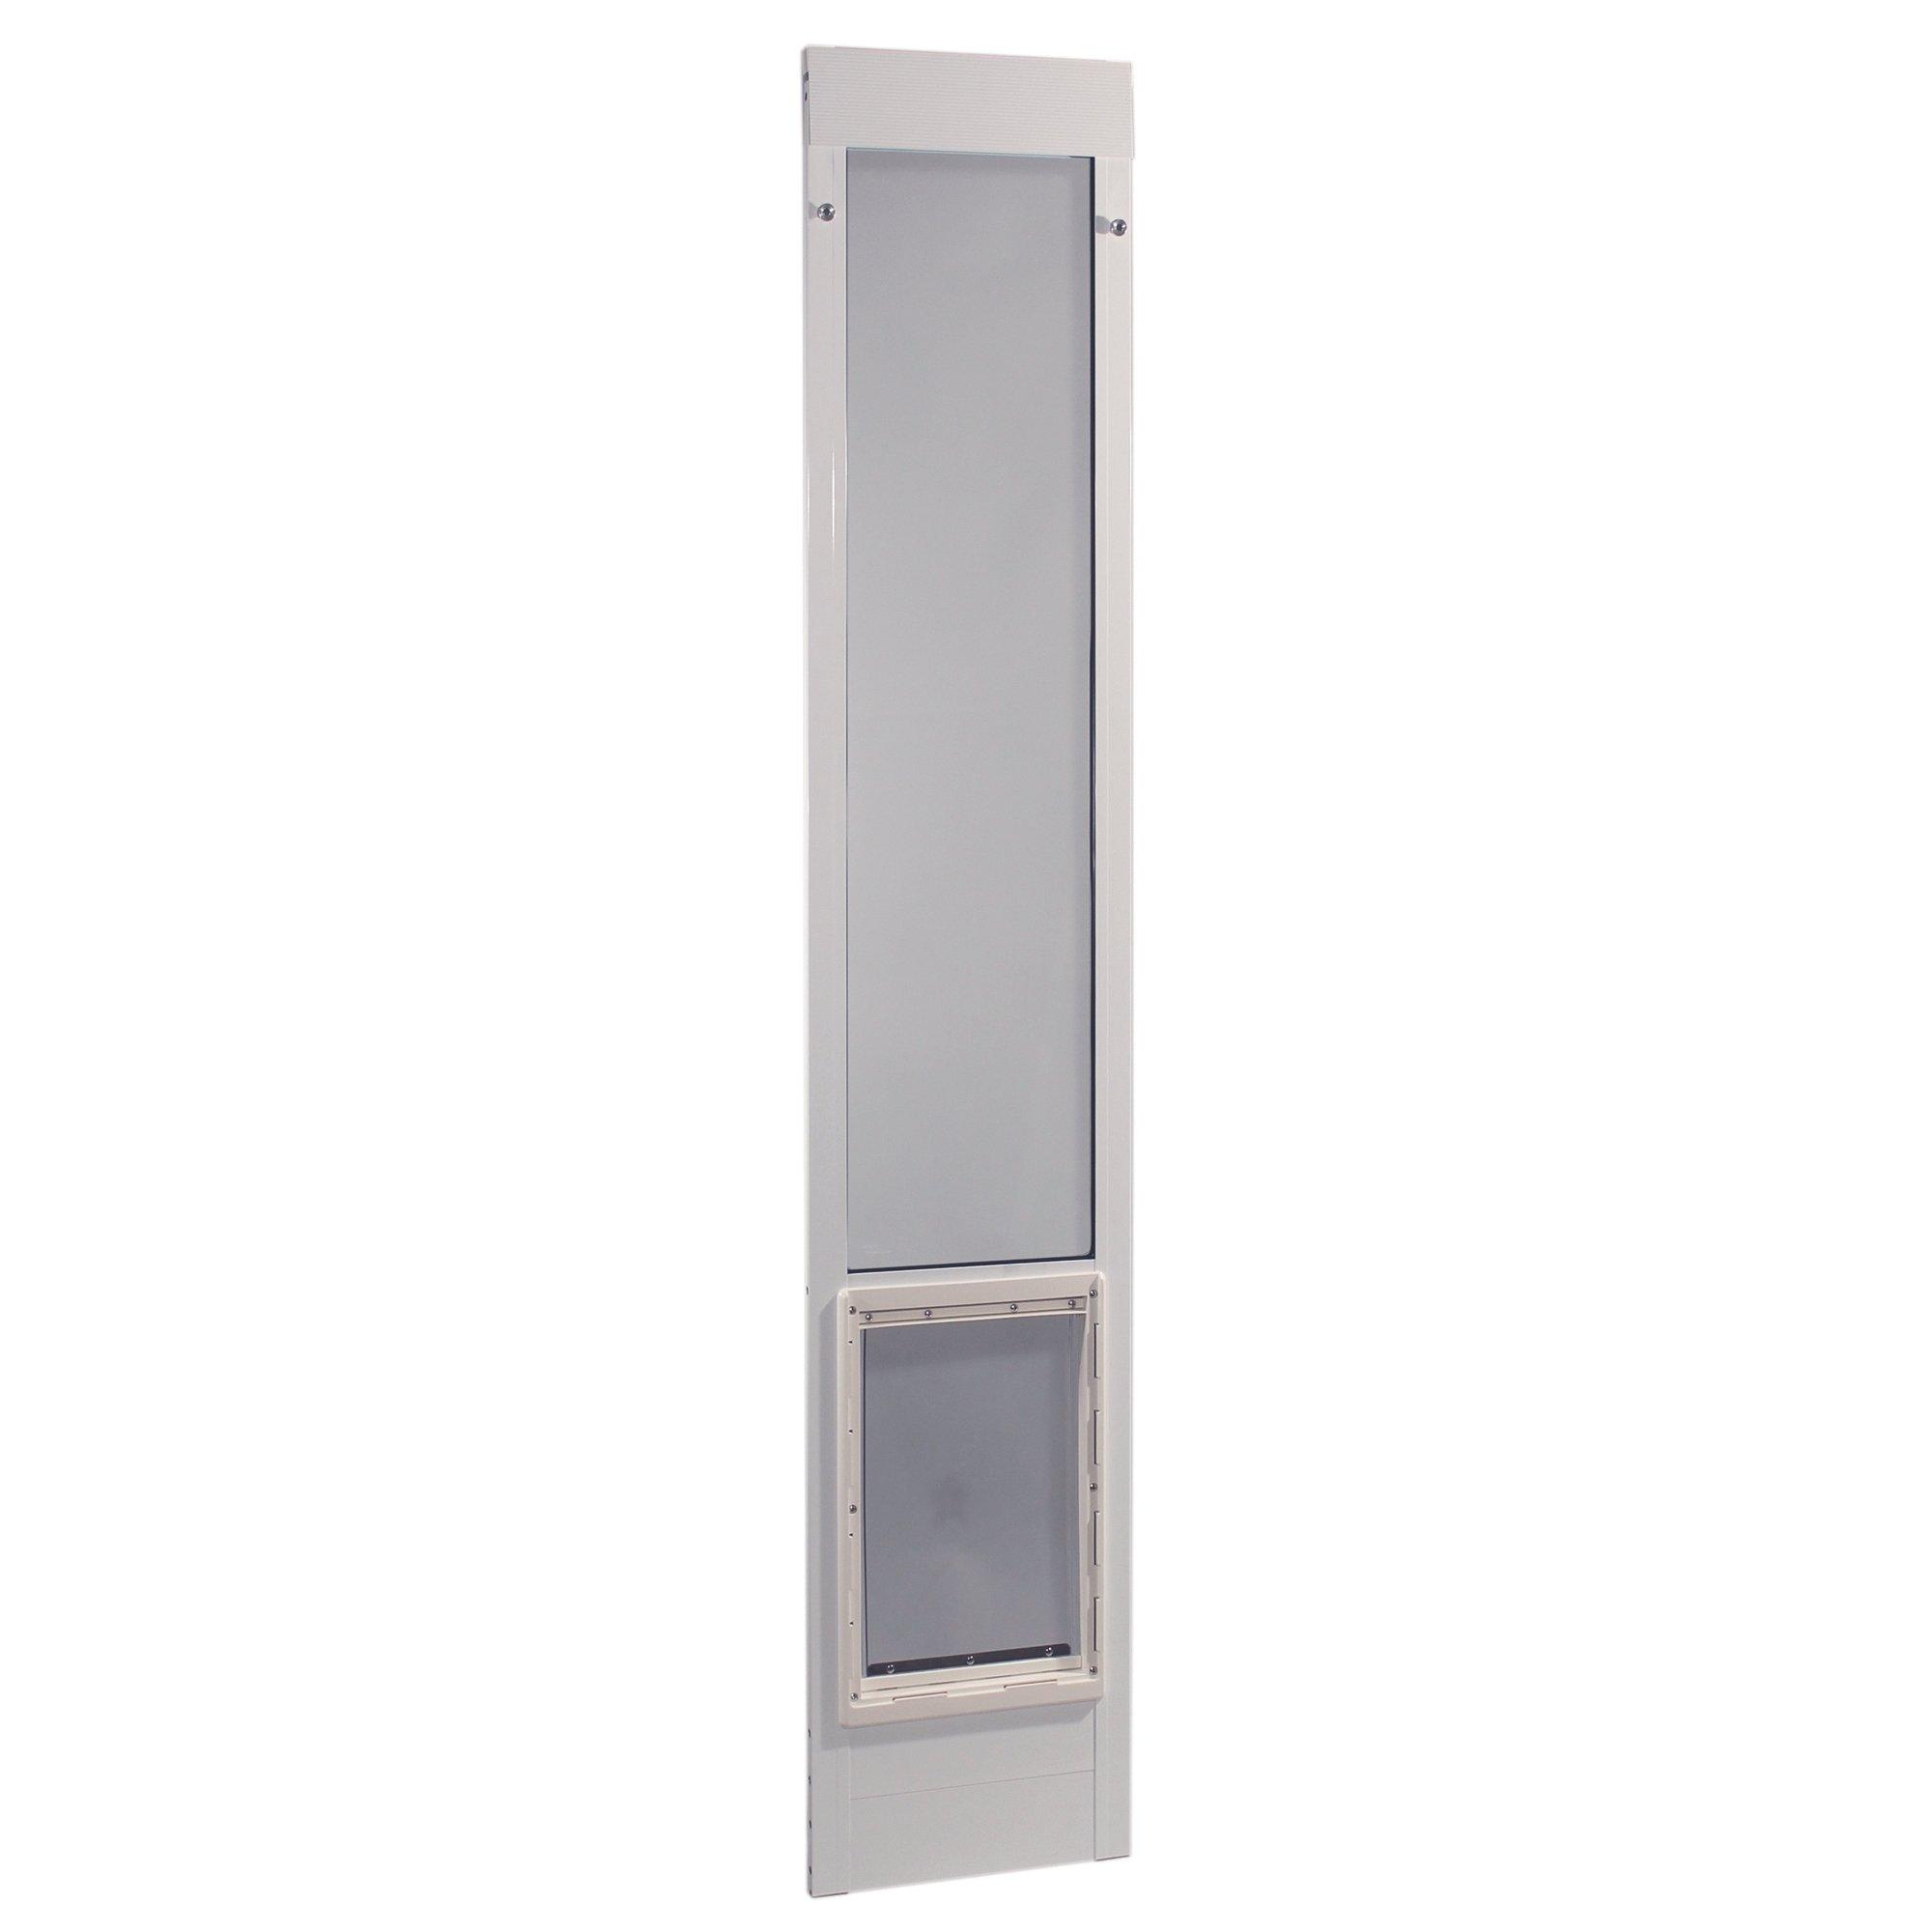 Ideal Pet Products 75PATXLW 75'' Fast Fit Aluminum Pet Patio Door, X-Large/10.5'' x 15'', White